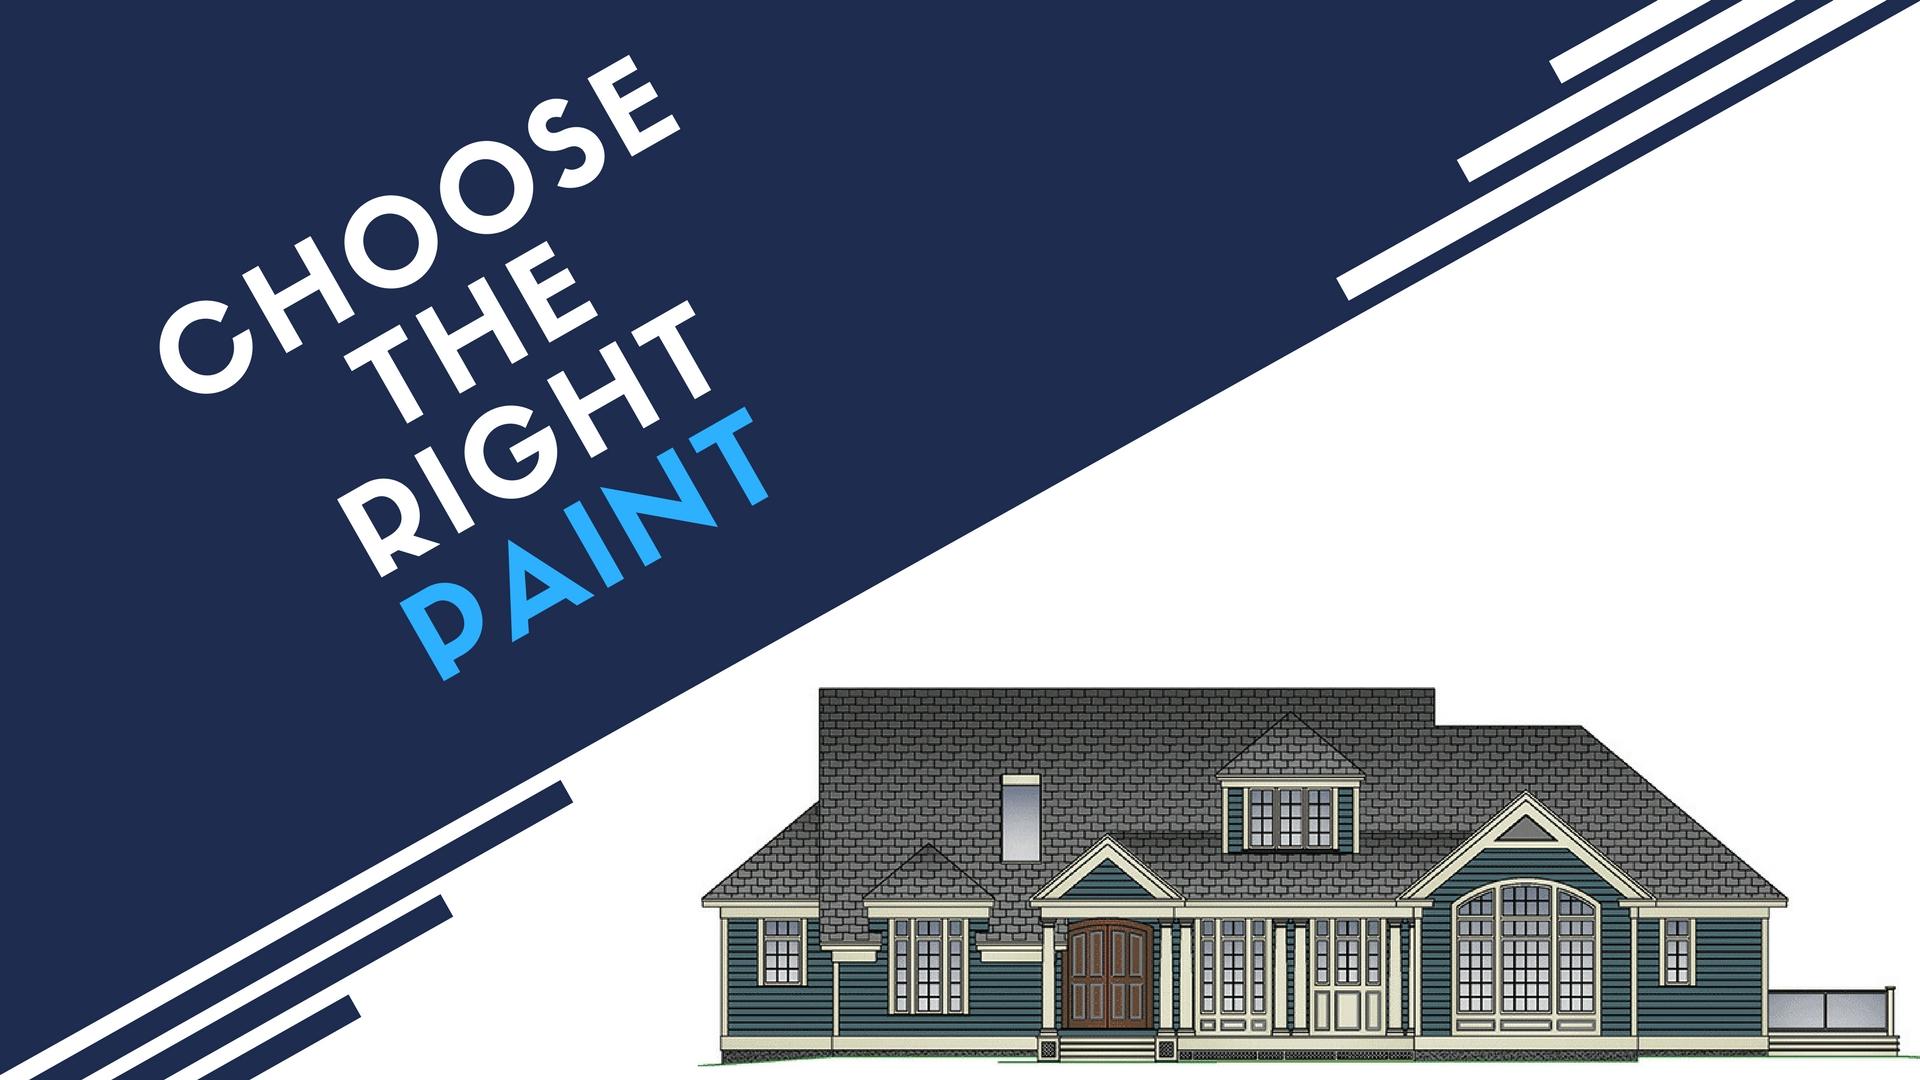 House - HD Wallpaper